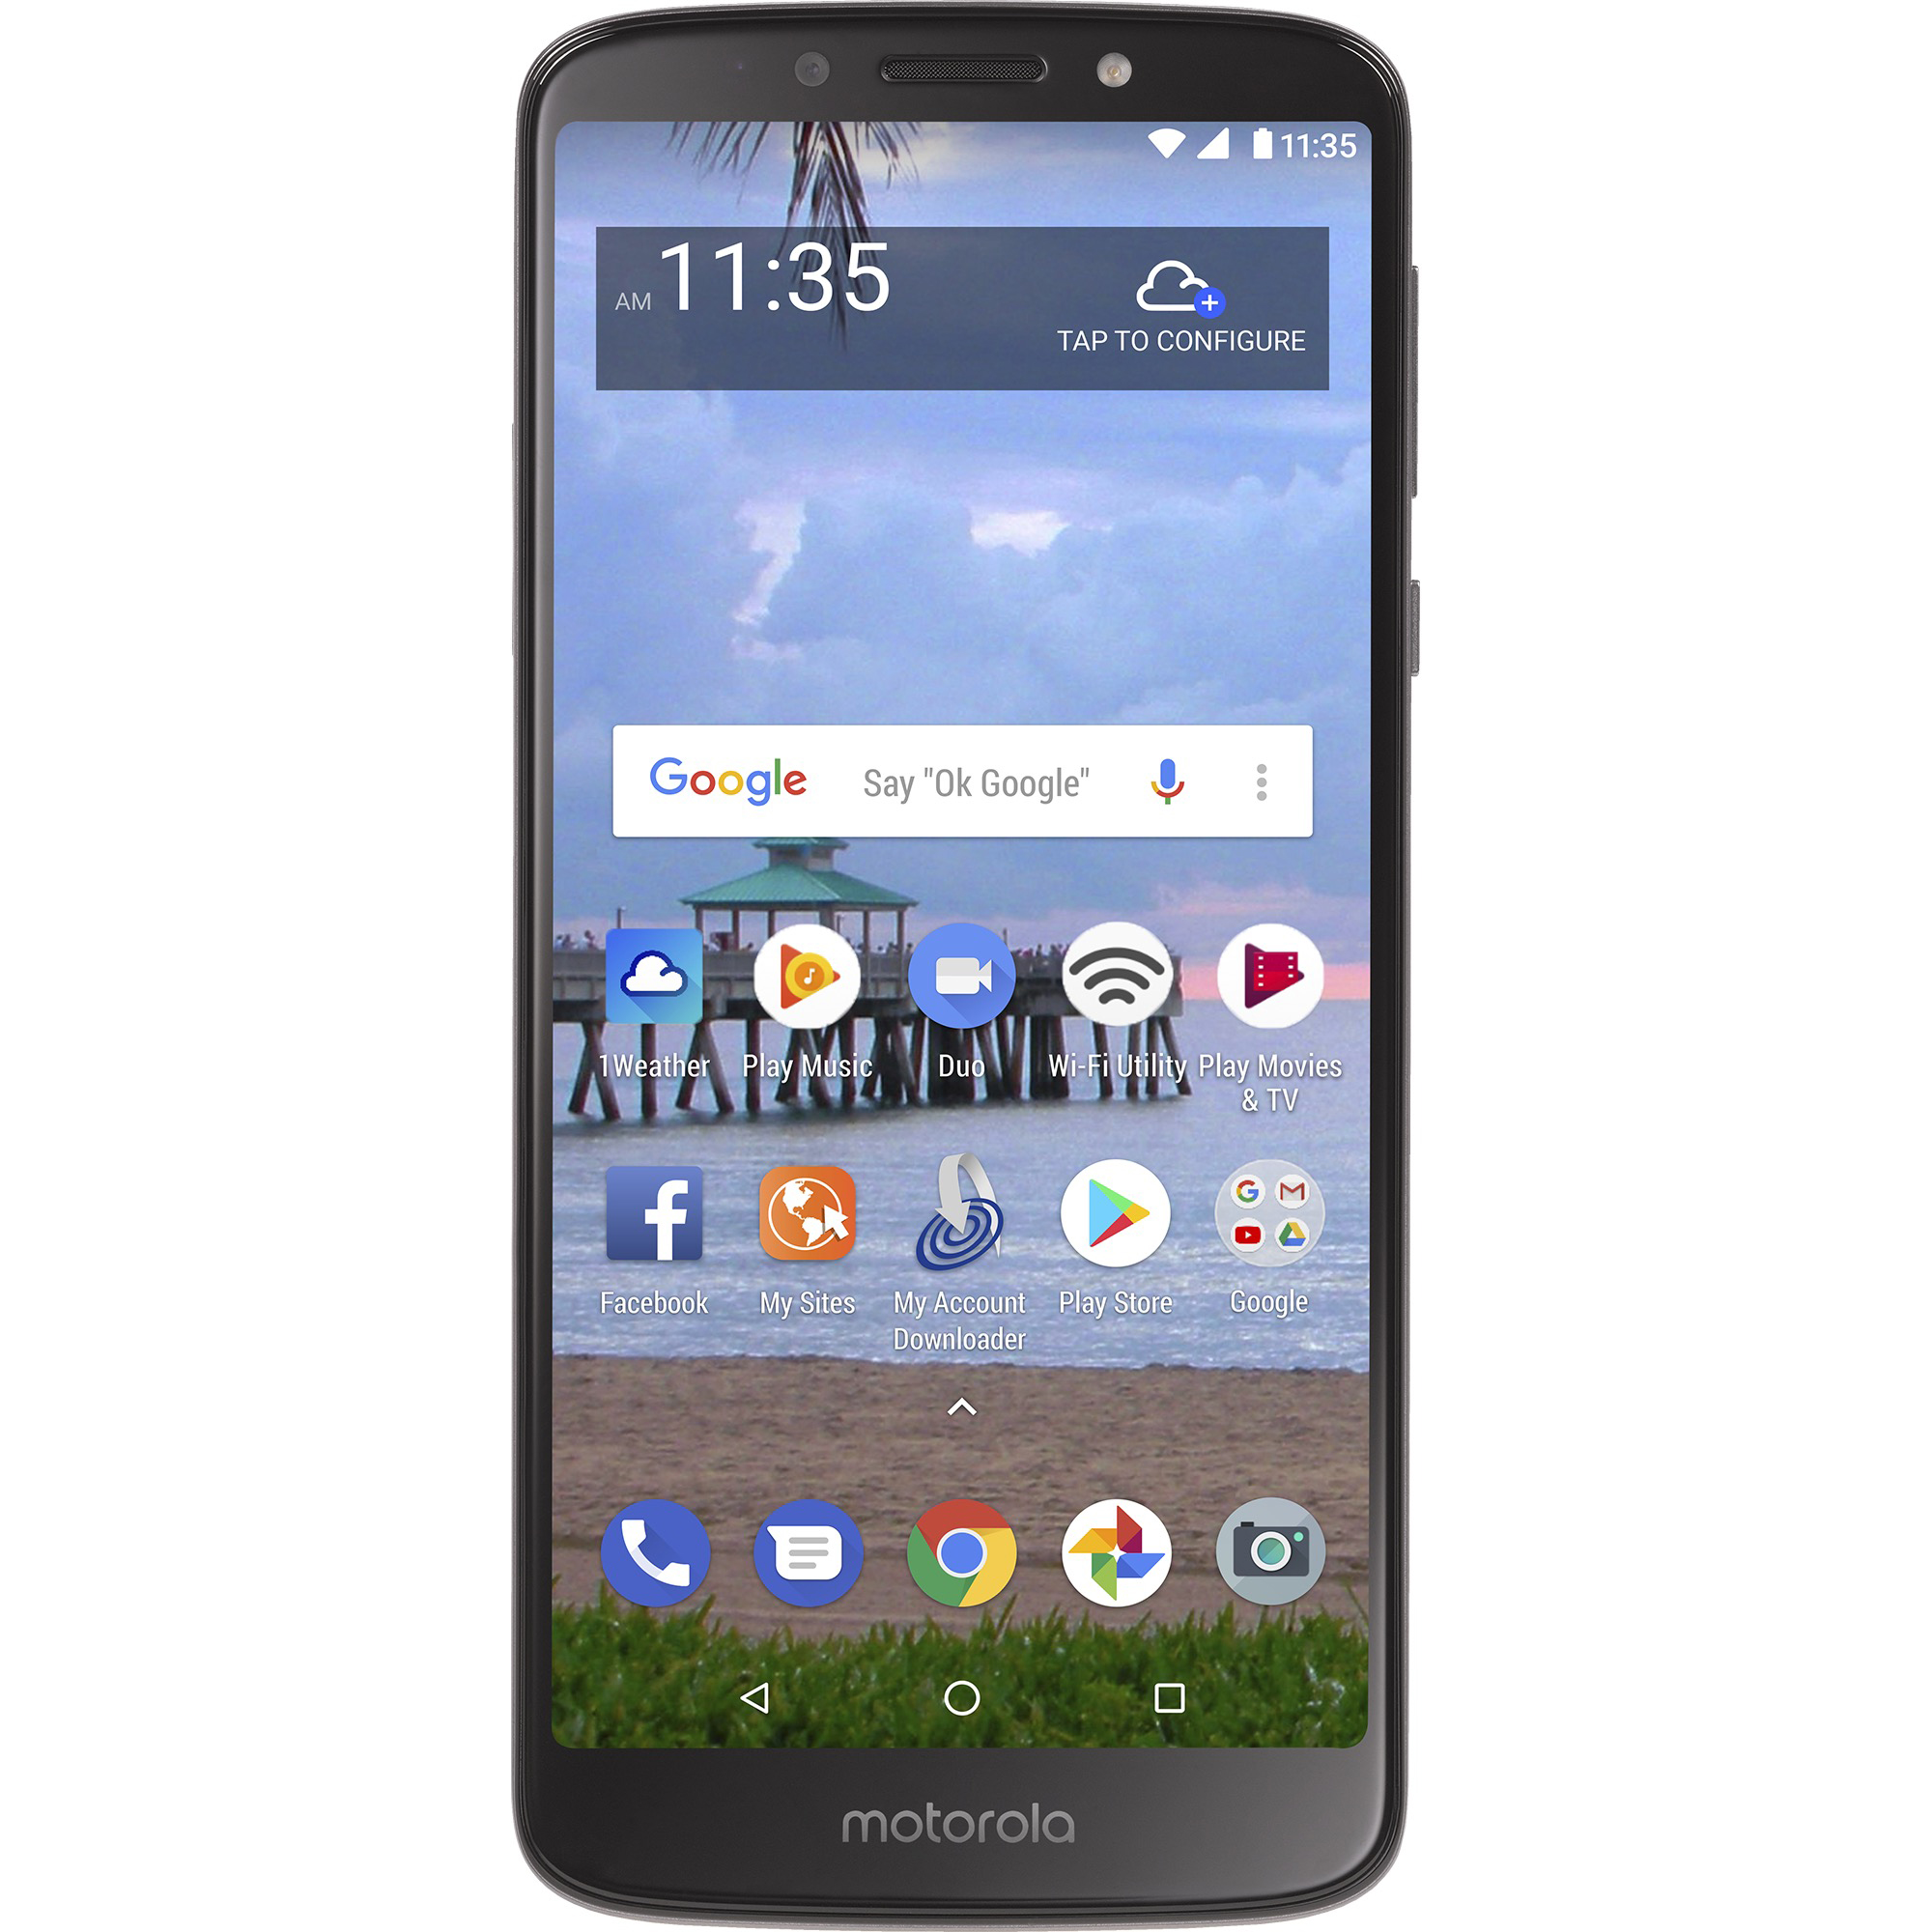 Walmart Family Mobile Motorola e5 Prepaid Smartphone